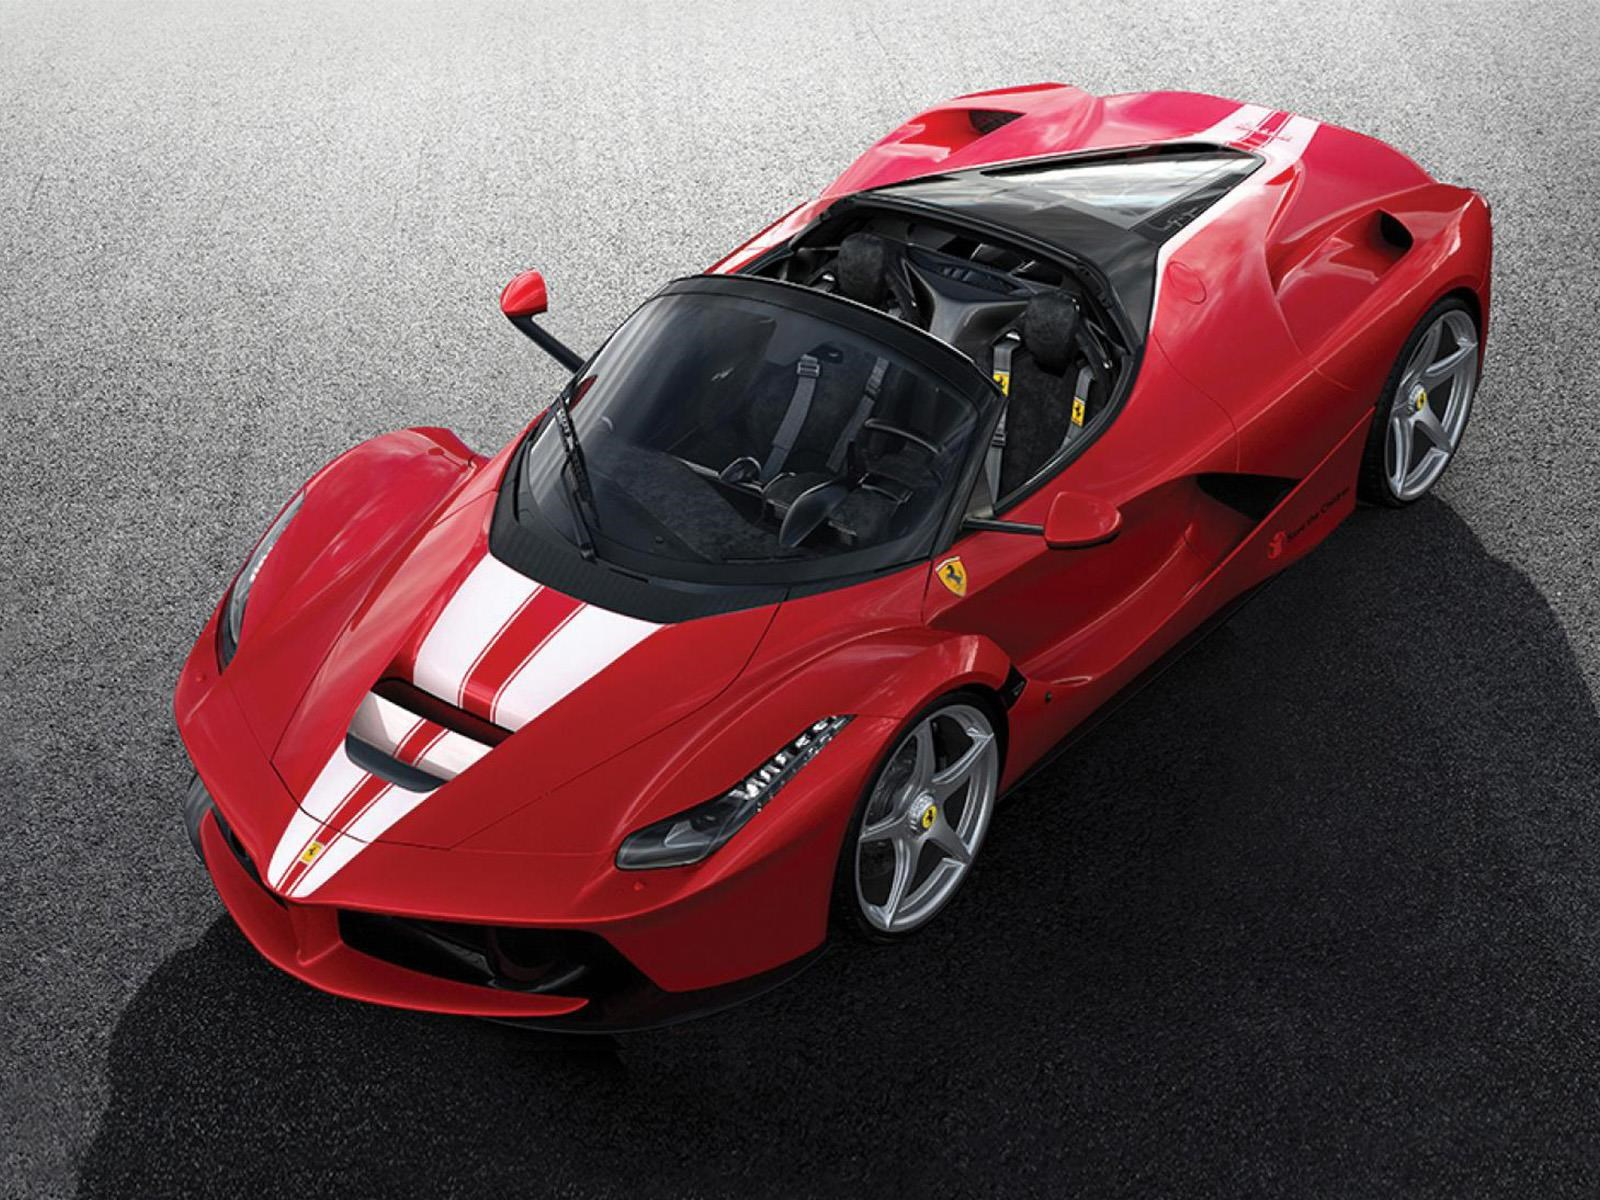 Último Ferrari LaFerrari se subasta en 8.3 millones de euros